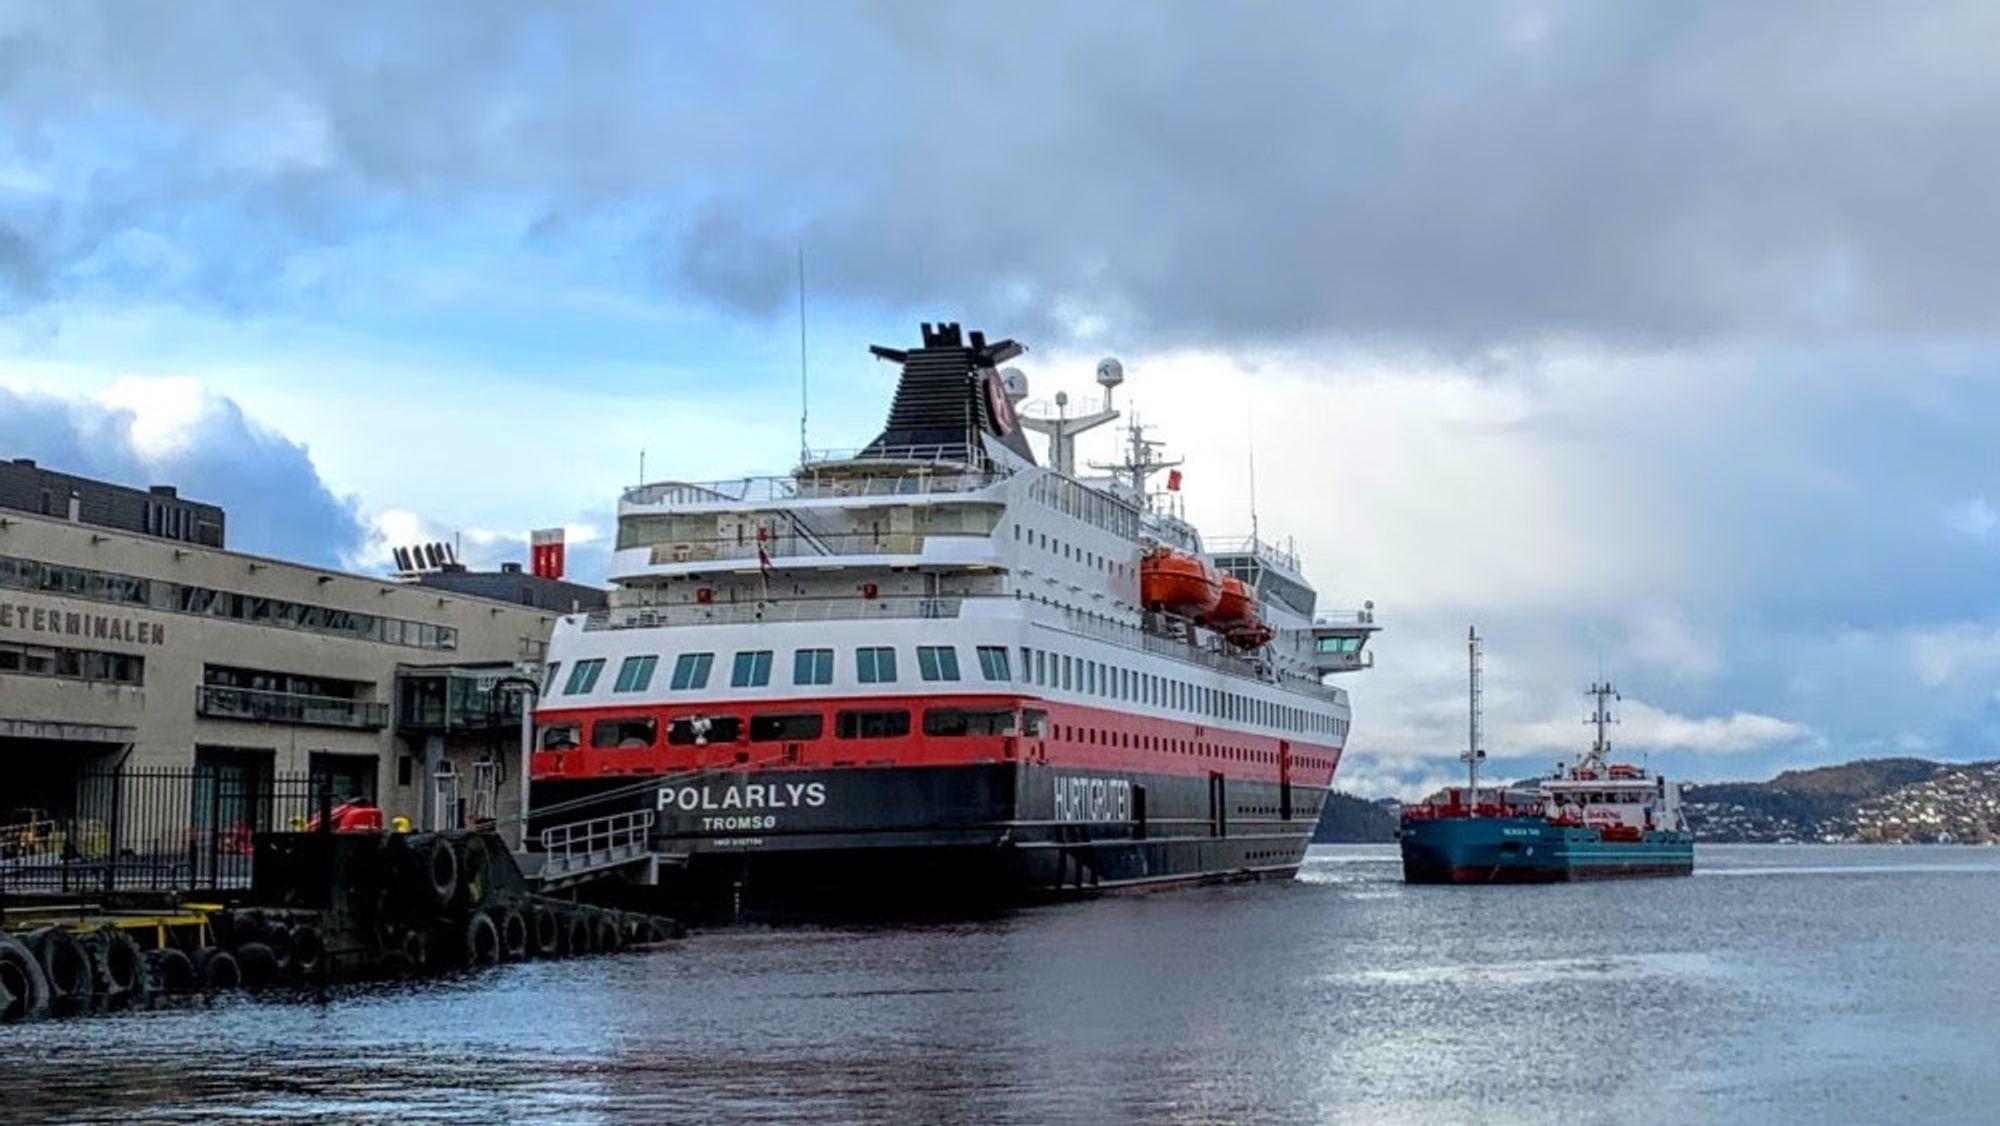 Hurtigruteskipet Polarlys testet biodiesel denne uken.